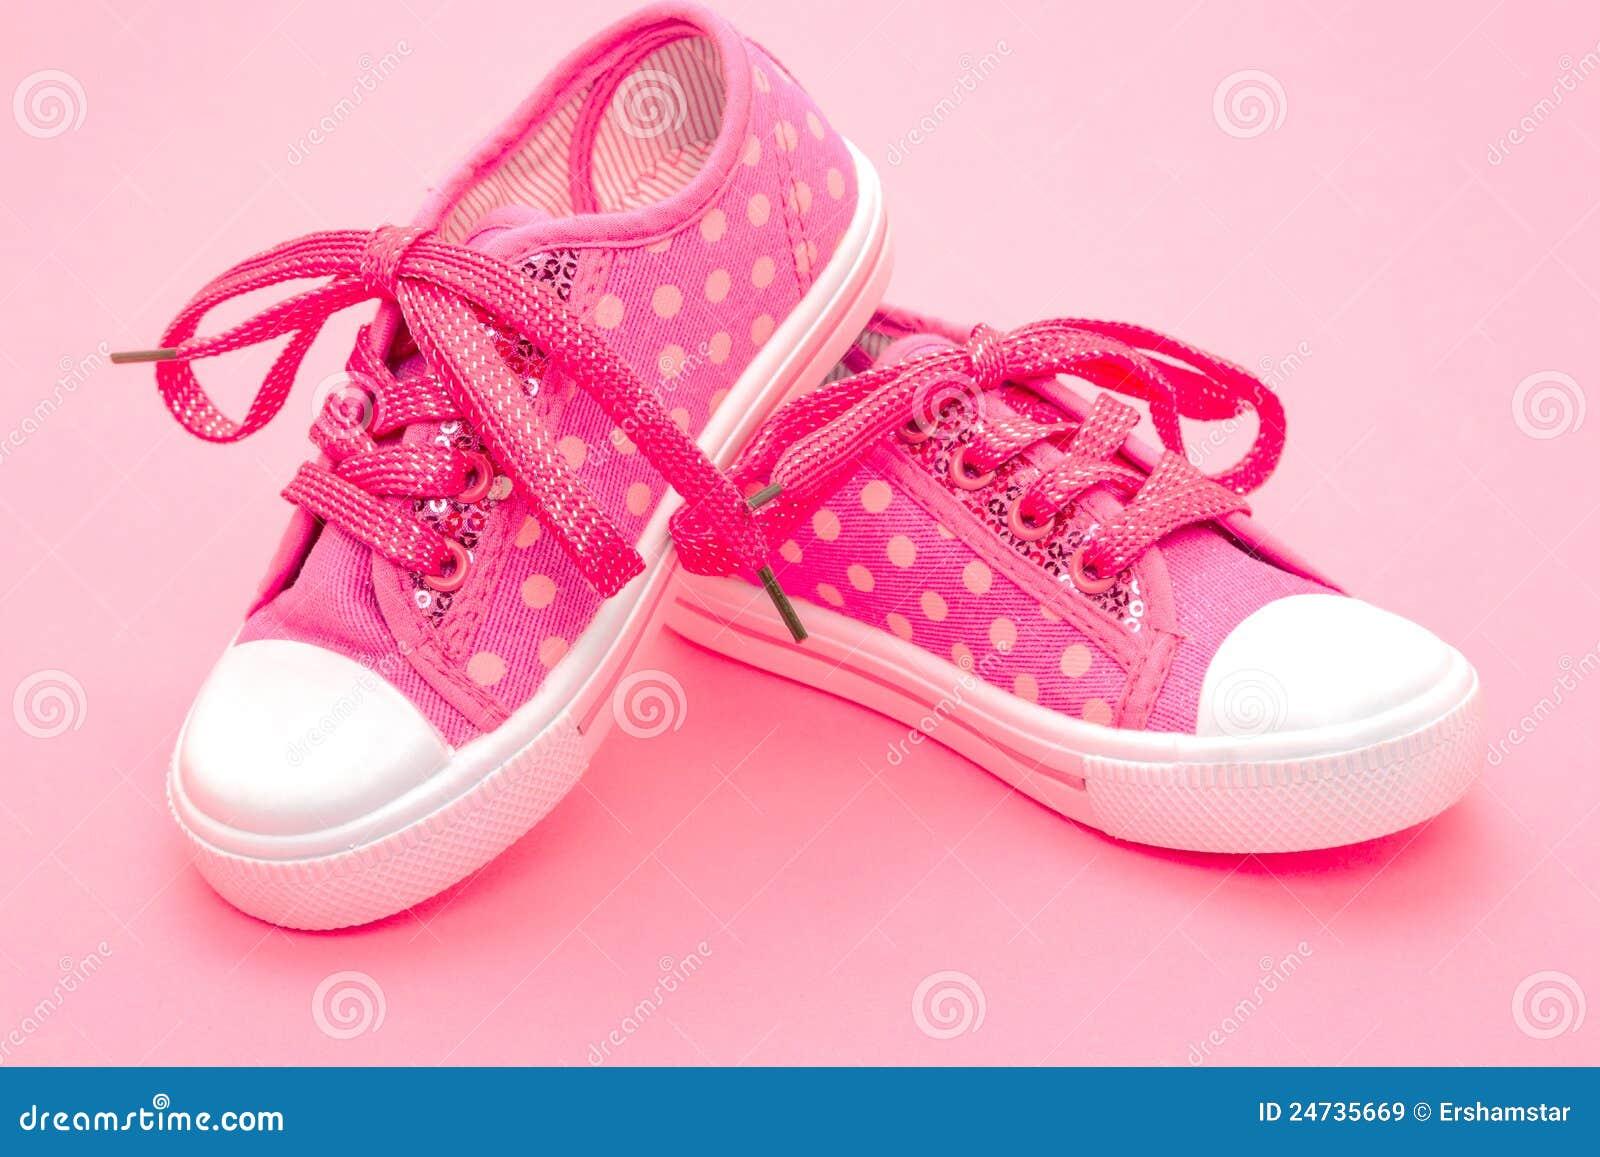 Pinken shoes litet barn